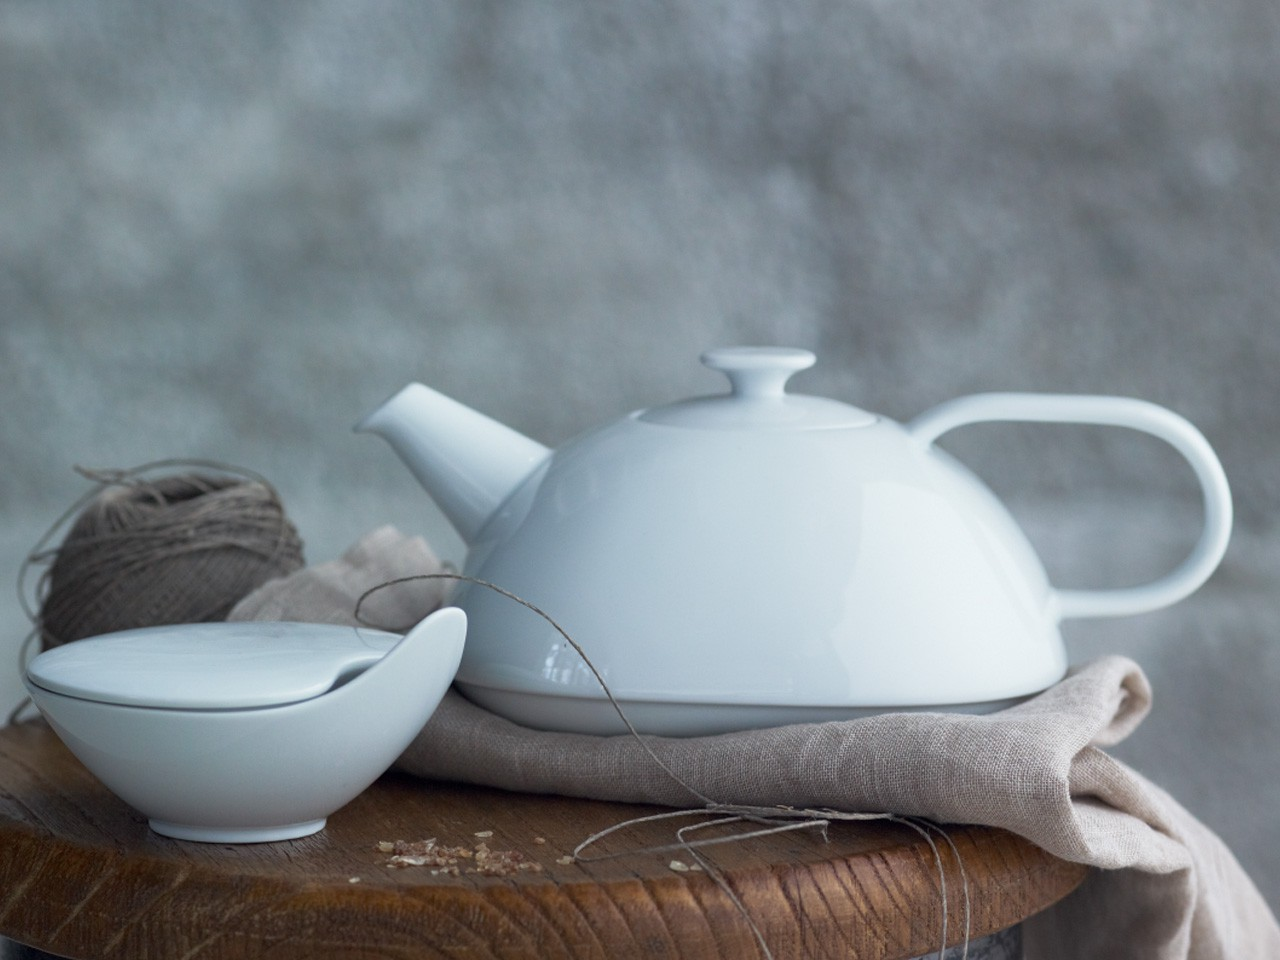 Rosenthal Free Spirit White coffee pot and sugar bowl on wooden surface